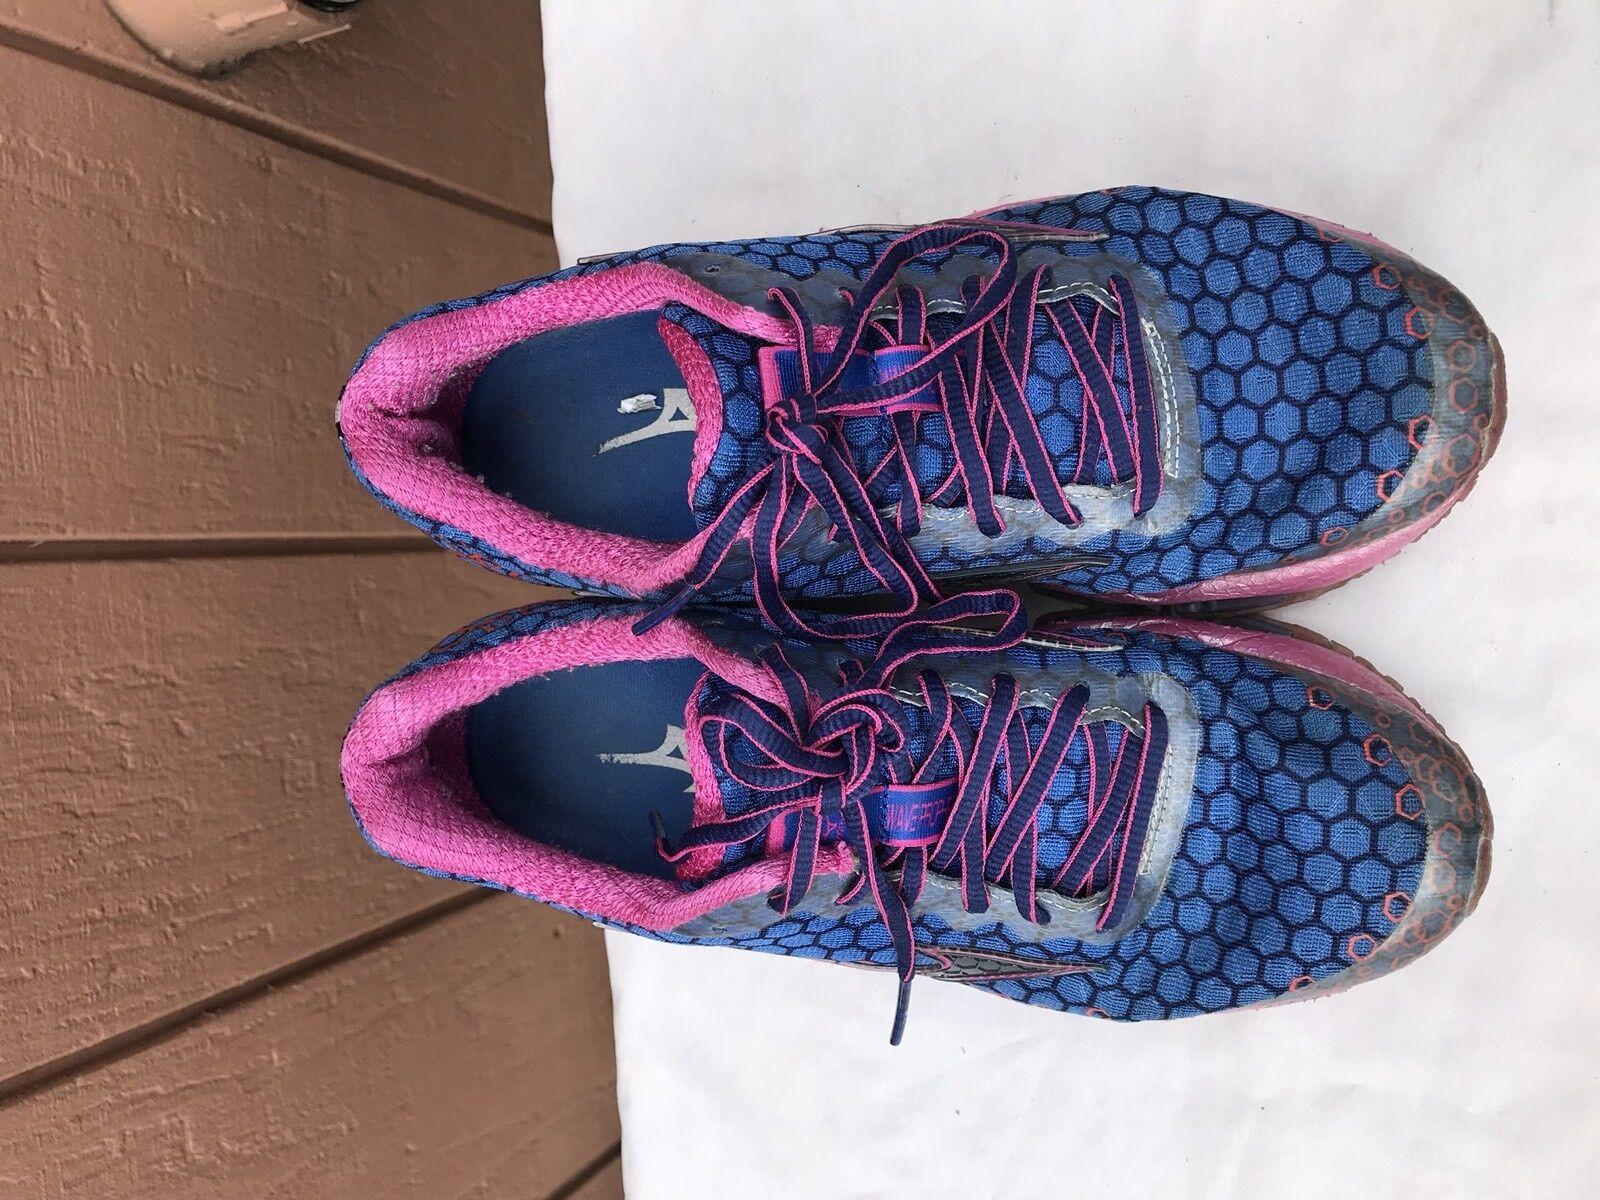 EUC Mizuno Wave Prophecy 3 bluee Pink Women's Women's Women's US 7.5 Running shoes Sneakers 302115